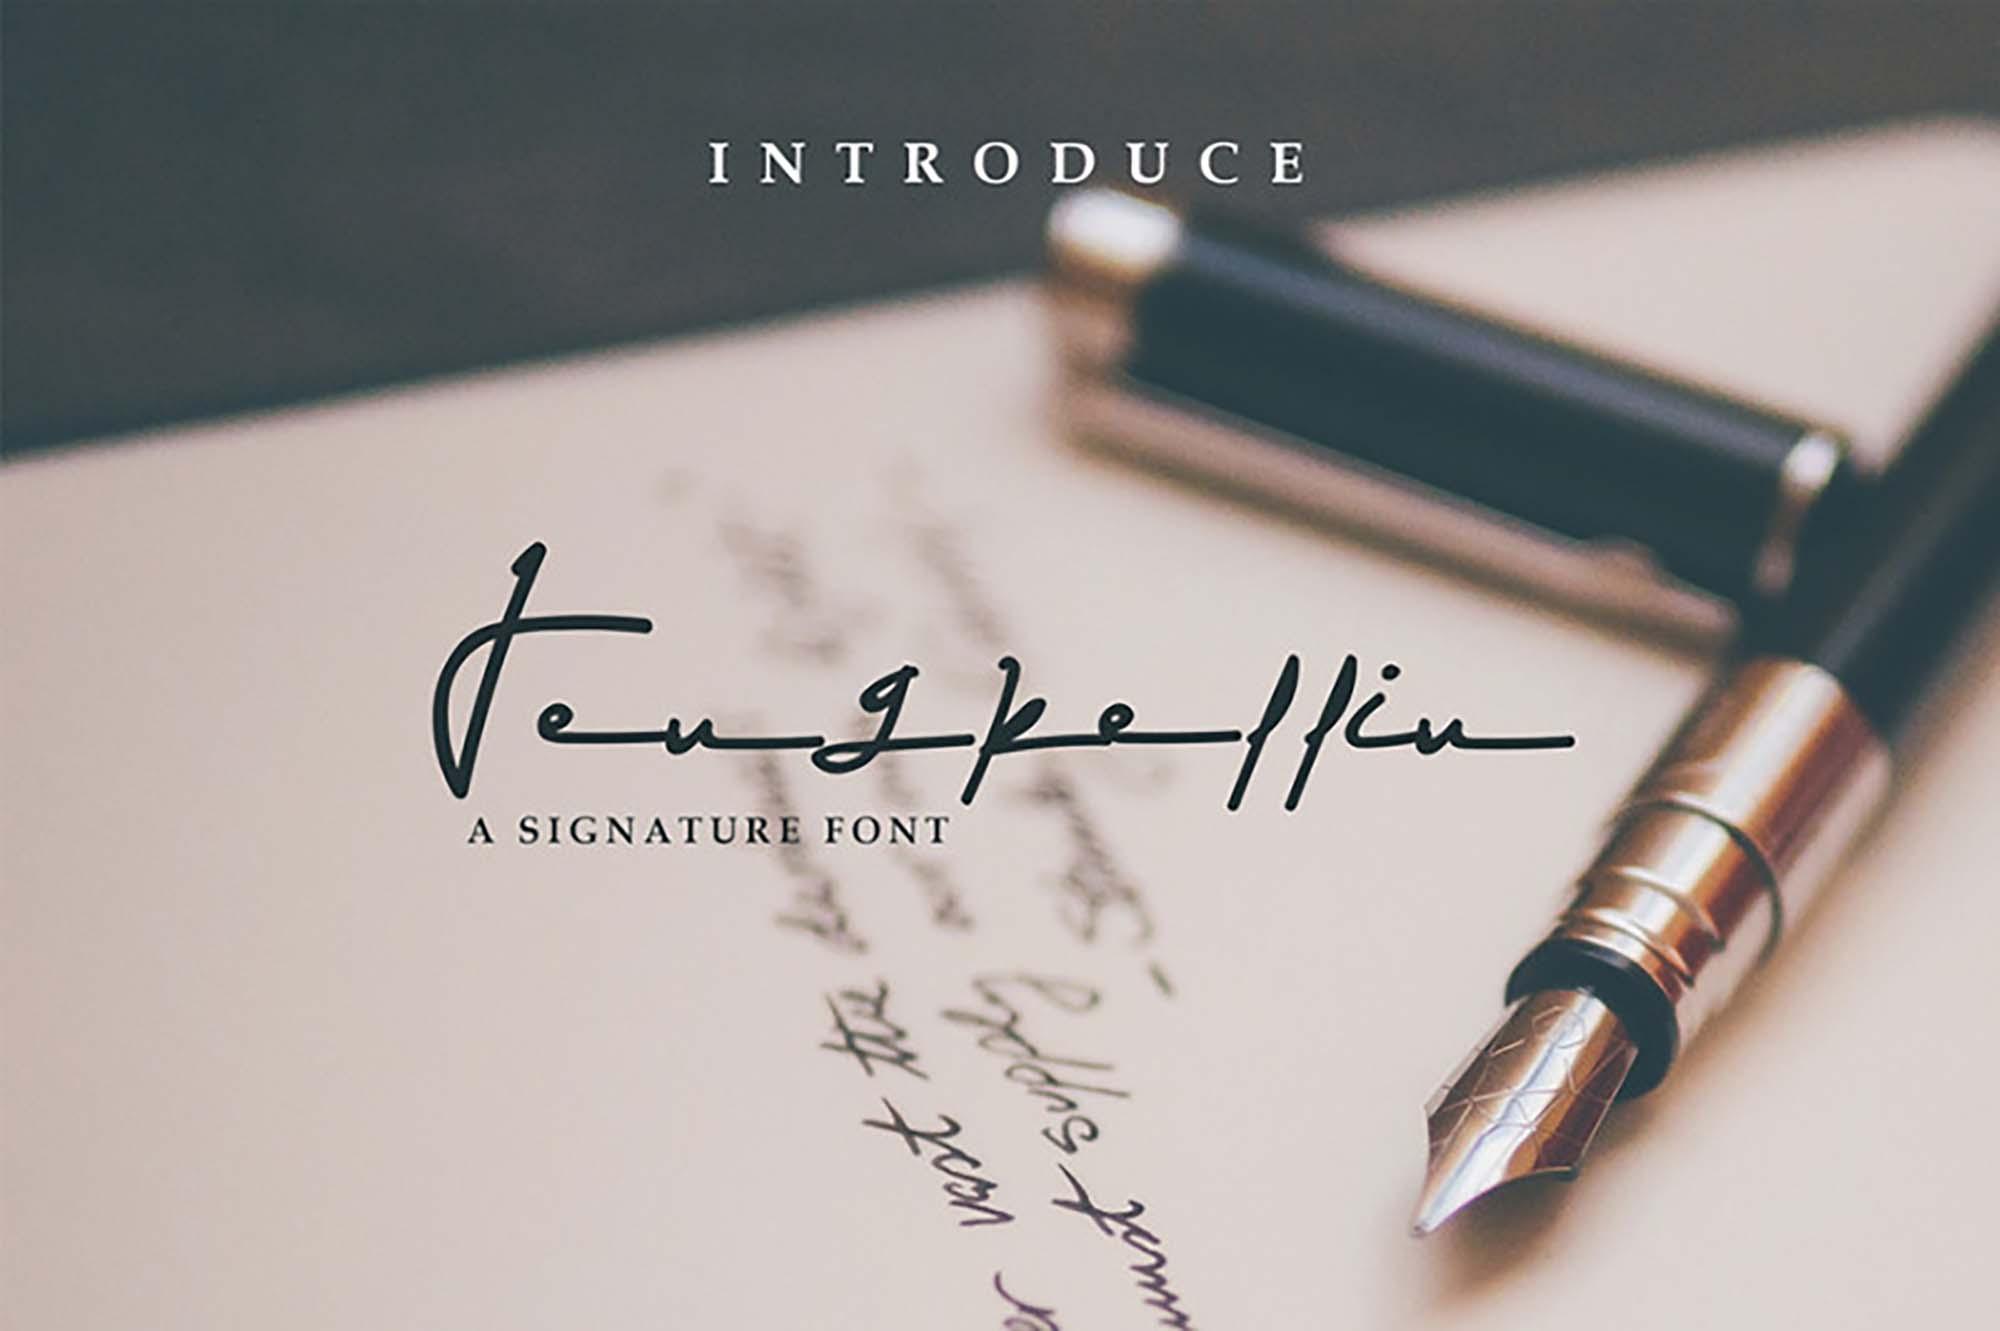 Jengkellin Signature Font